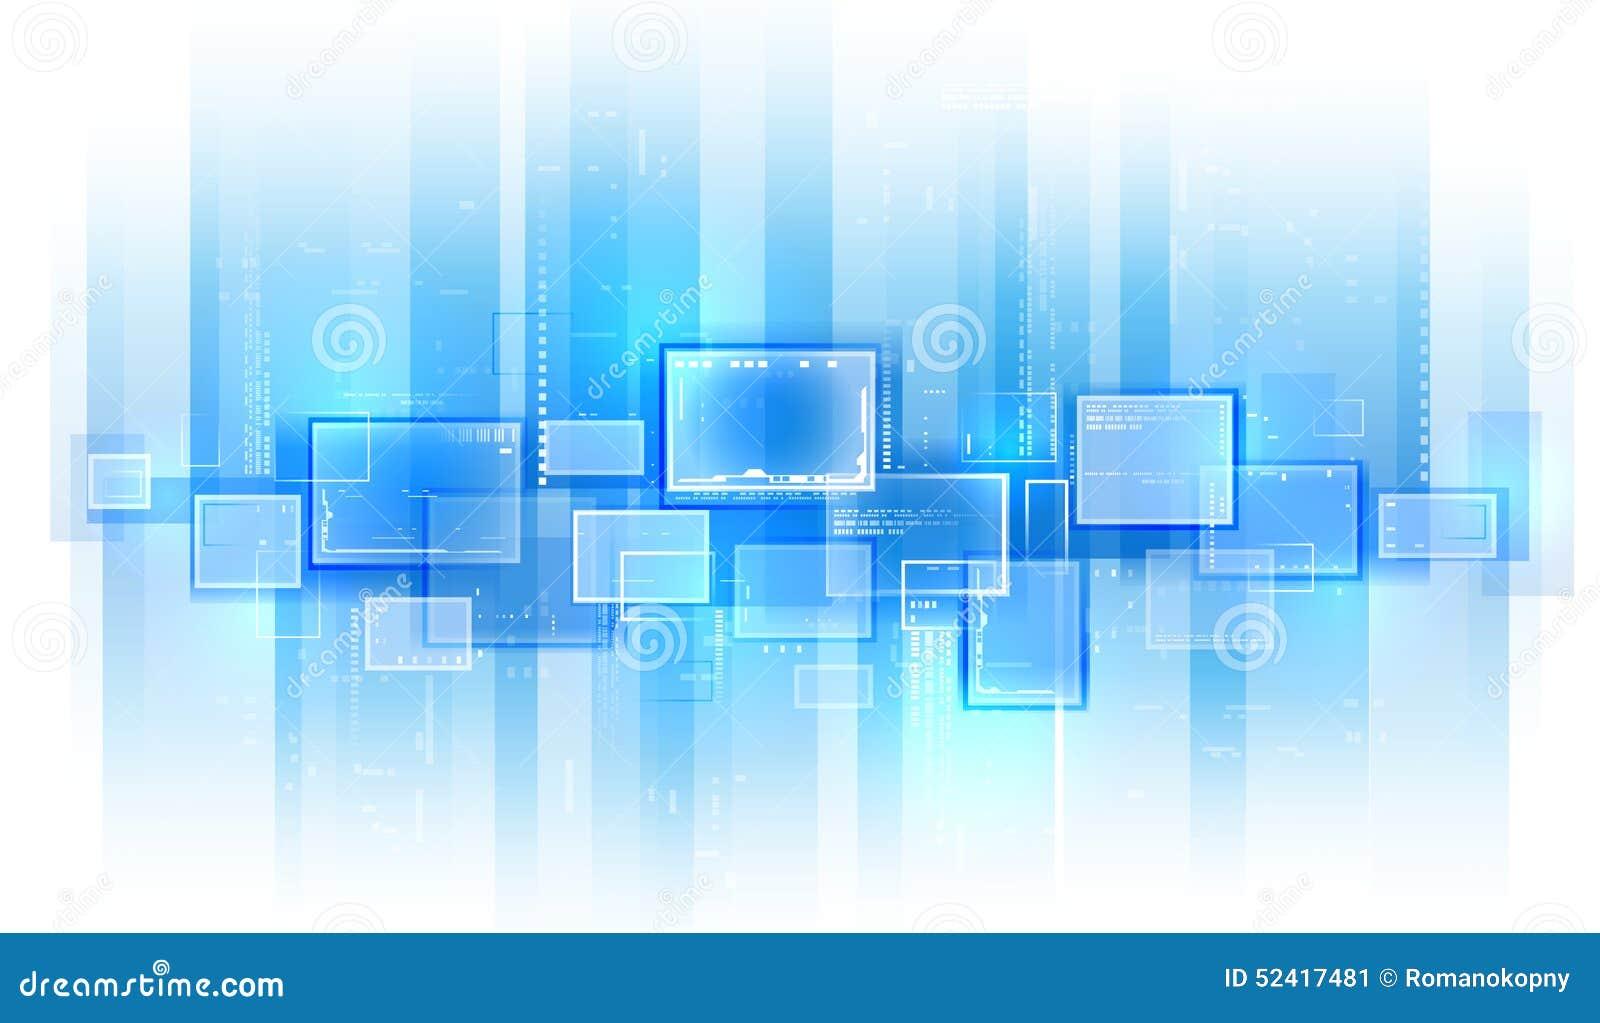 Blue Technology: Blue Tech Background. Stock Vector. Illustration Of Line